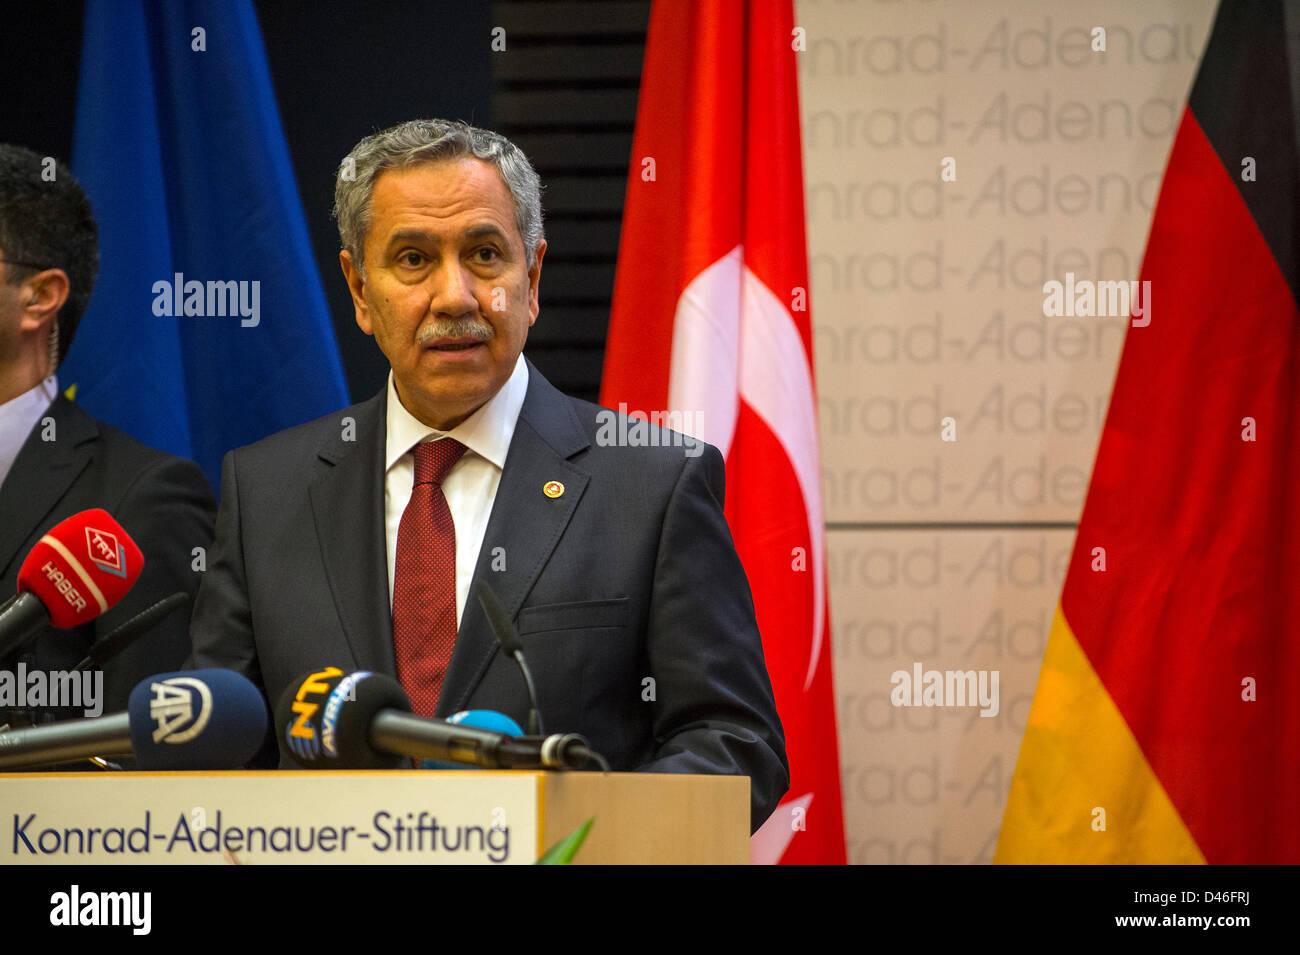 Berlin, Germany. 6th March, 2013.  Deputy Prime Minister of Turkey Bülent Arinç gives a speech about the - Stock Image